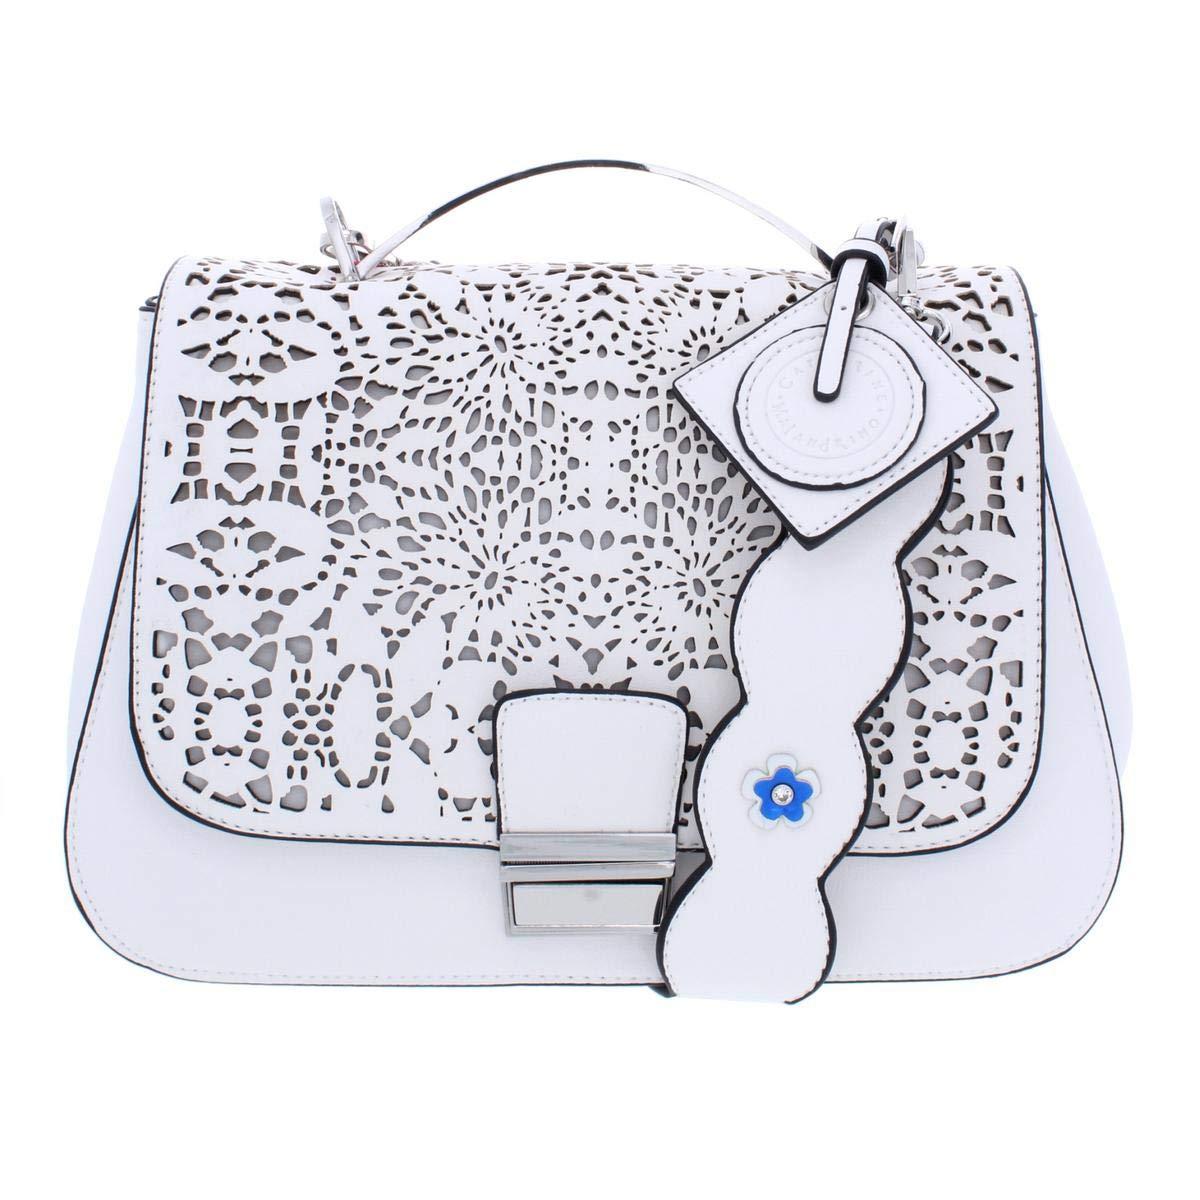 Catherine Malandrino Womens Lola Faux Leather Satchel Handbag White Medium